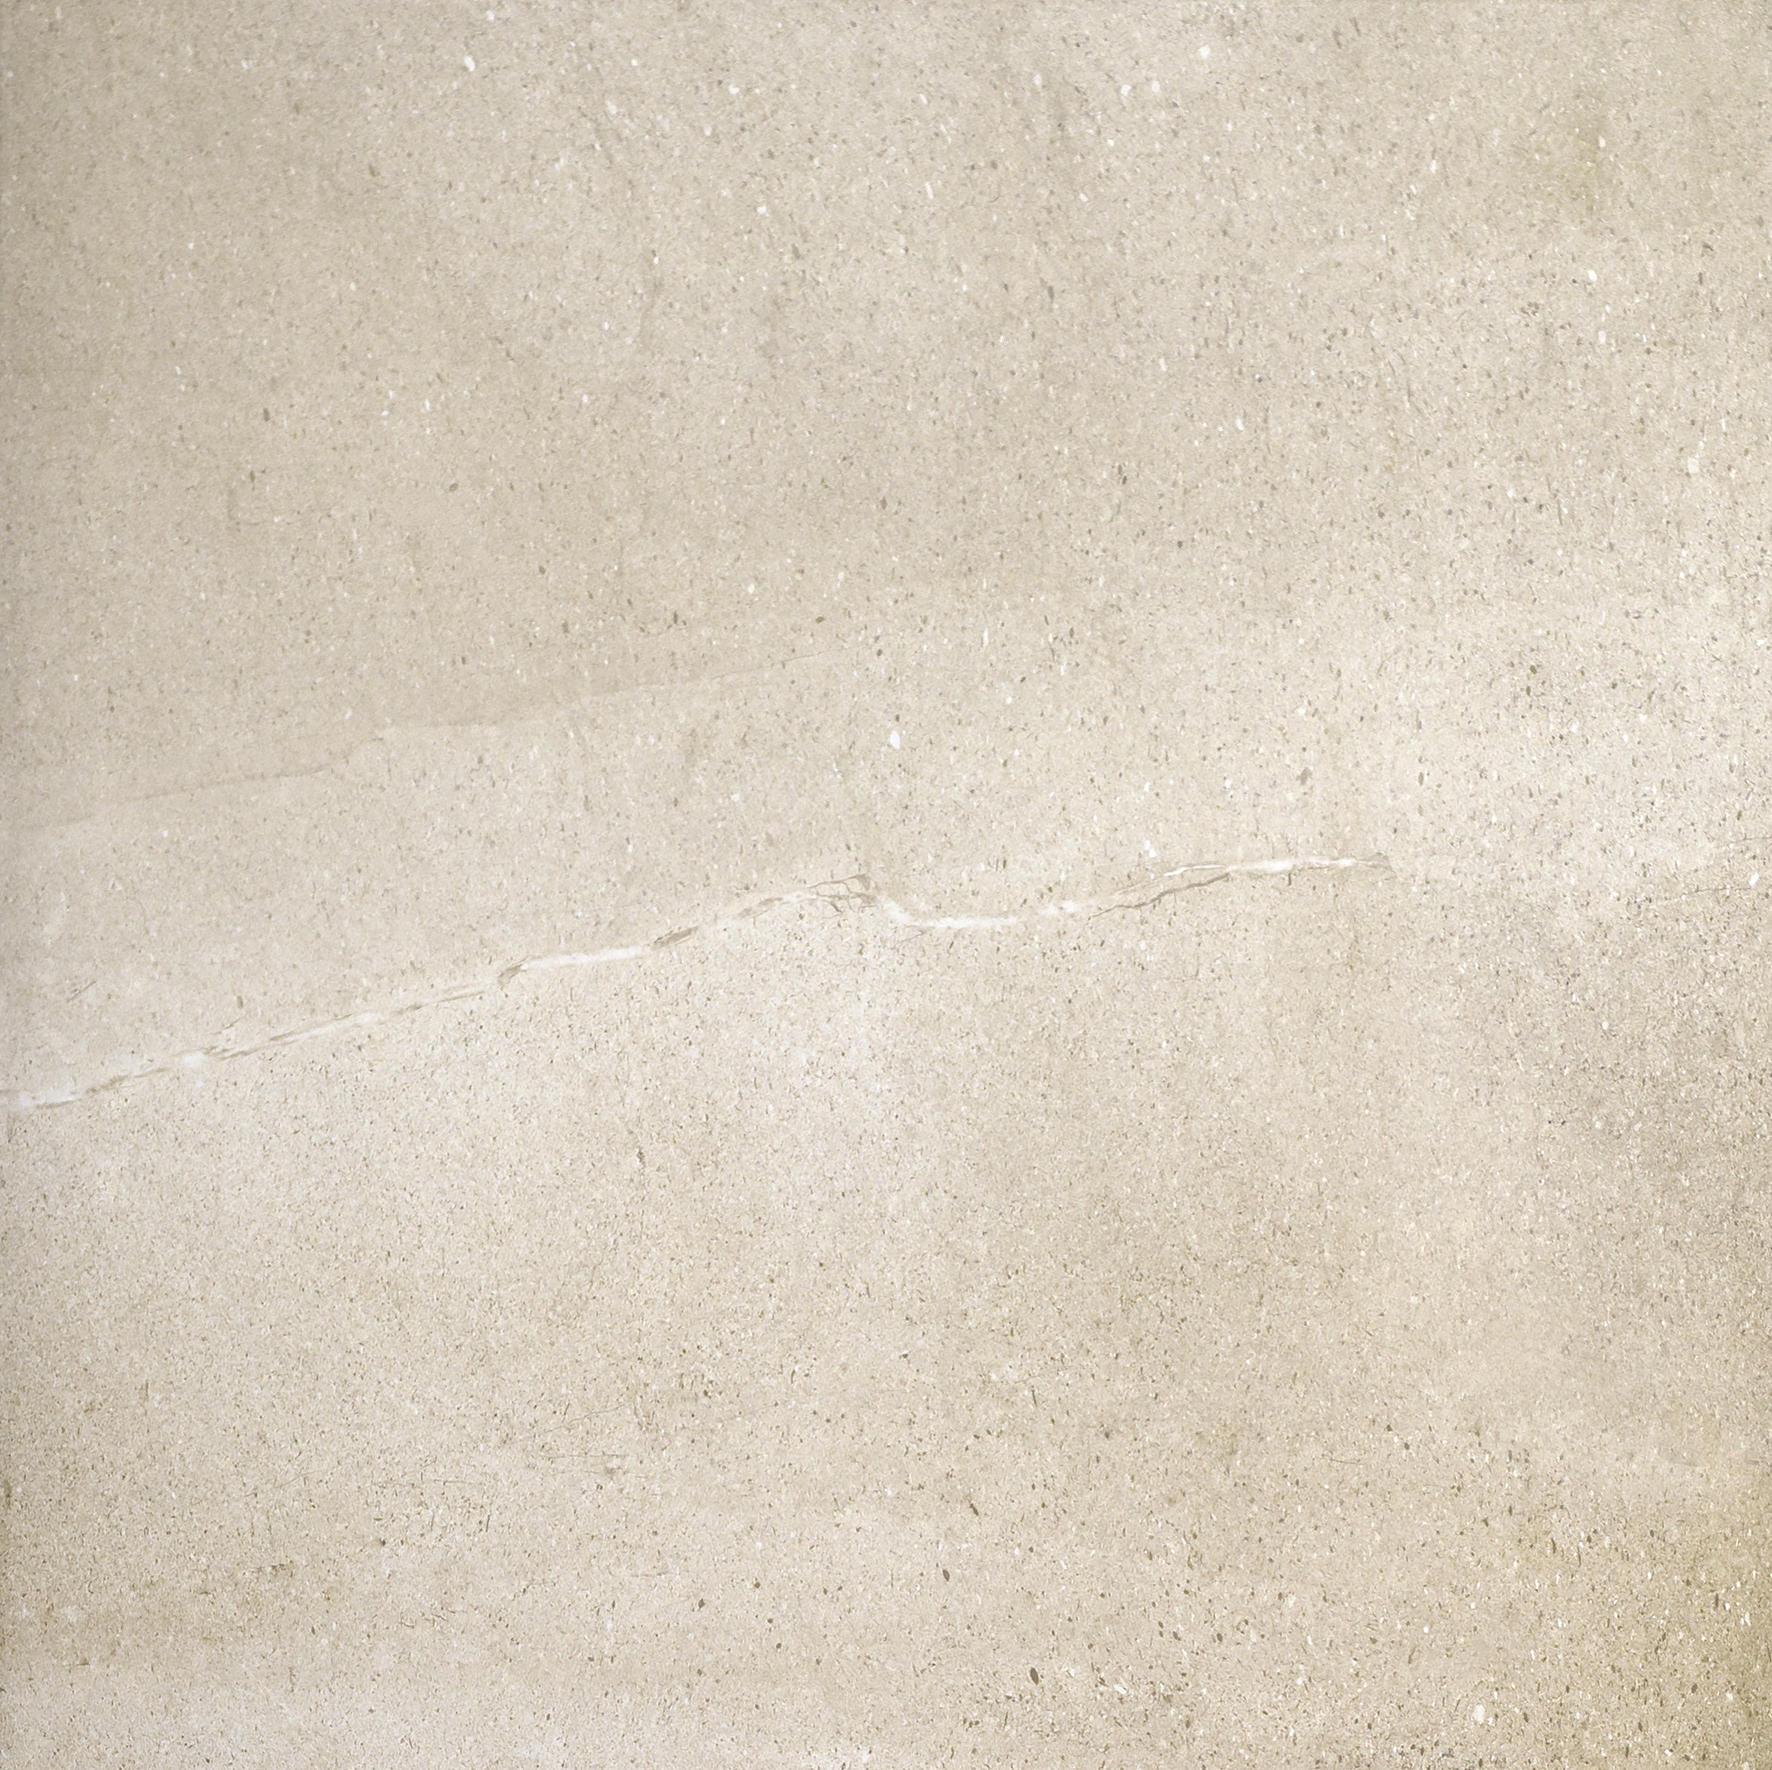 Stonewalk Beige Ceramic Tiles From Ascot Ceramiche Architonic